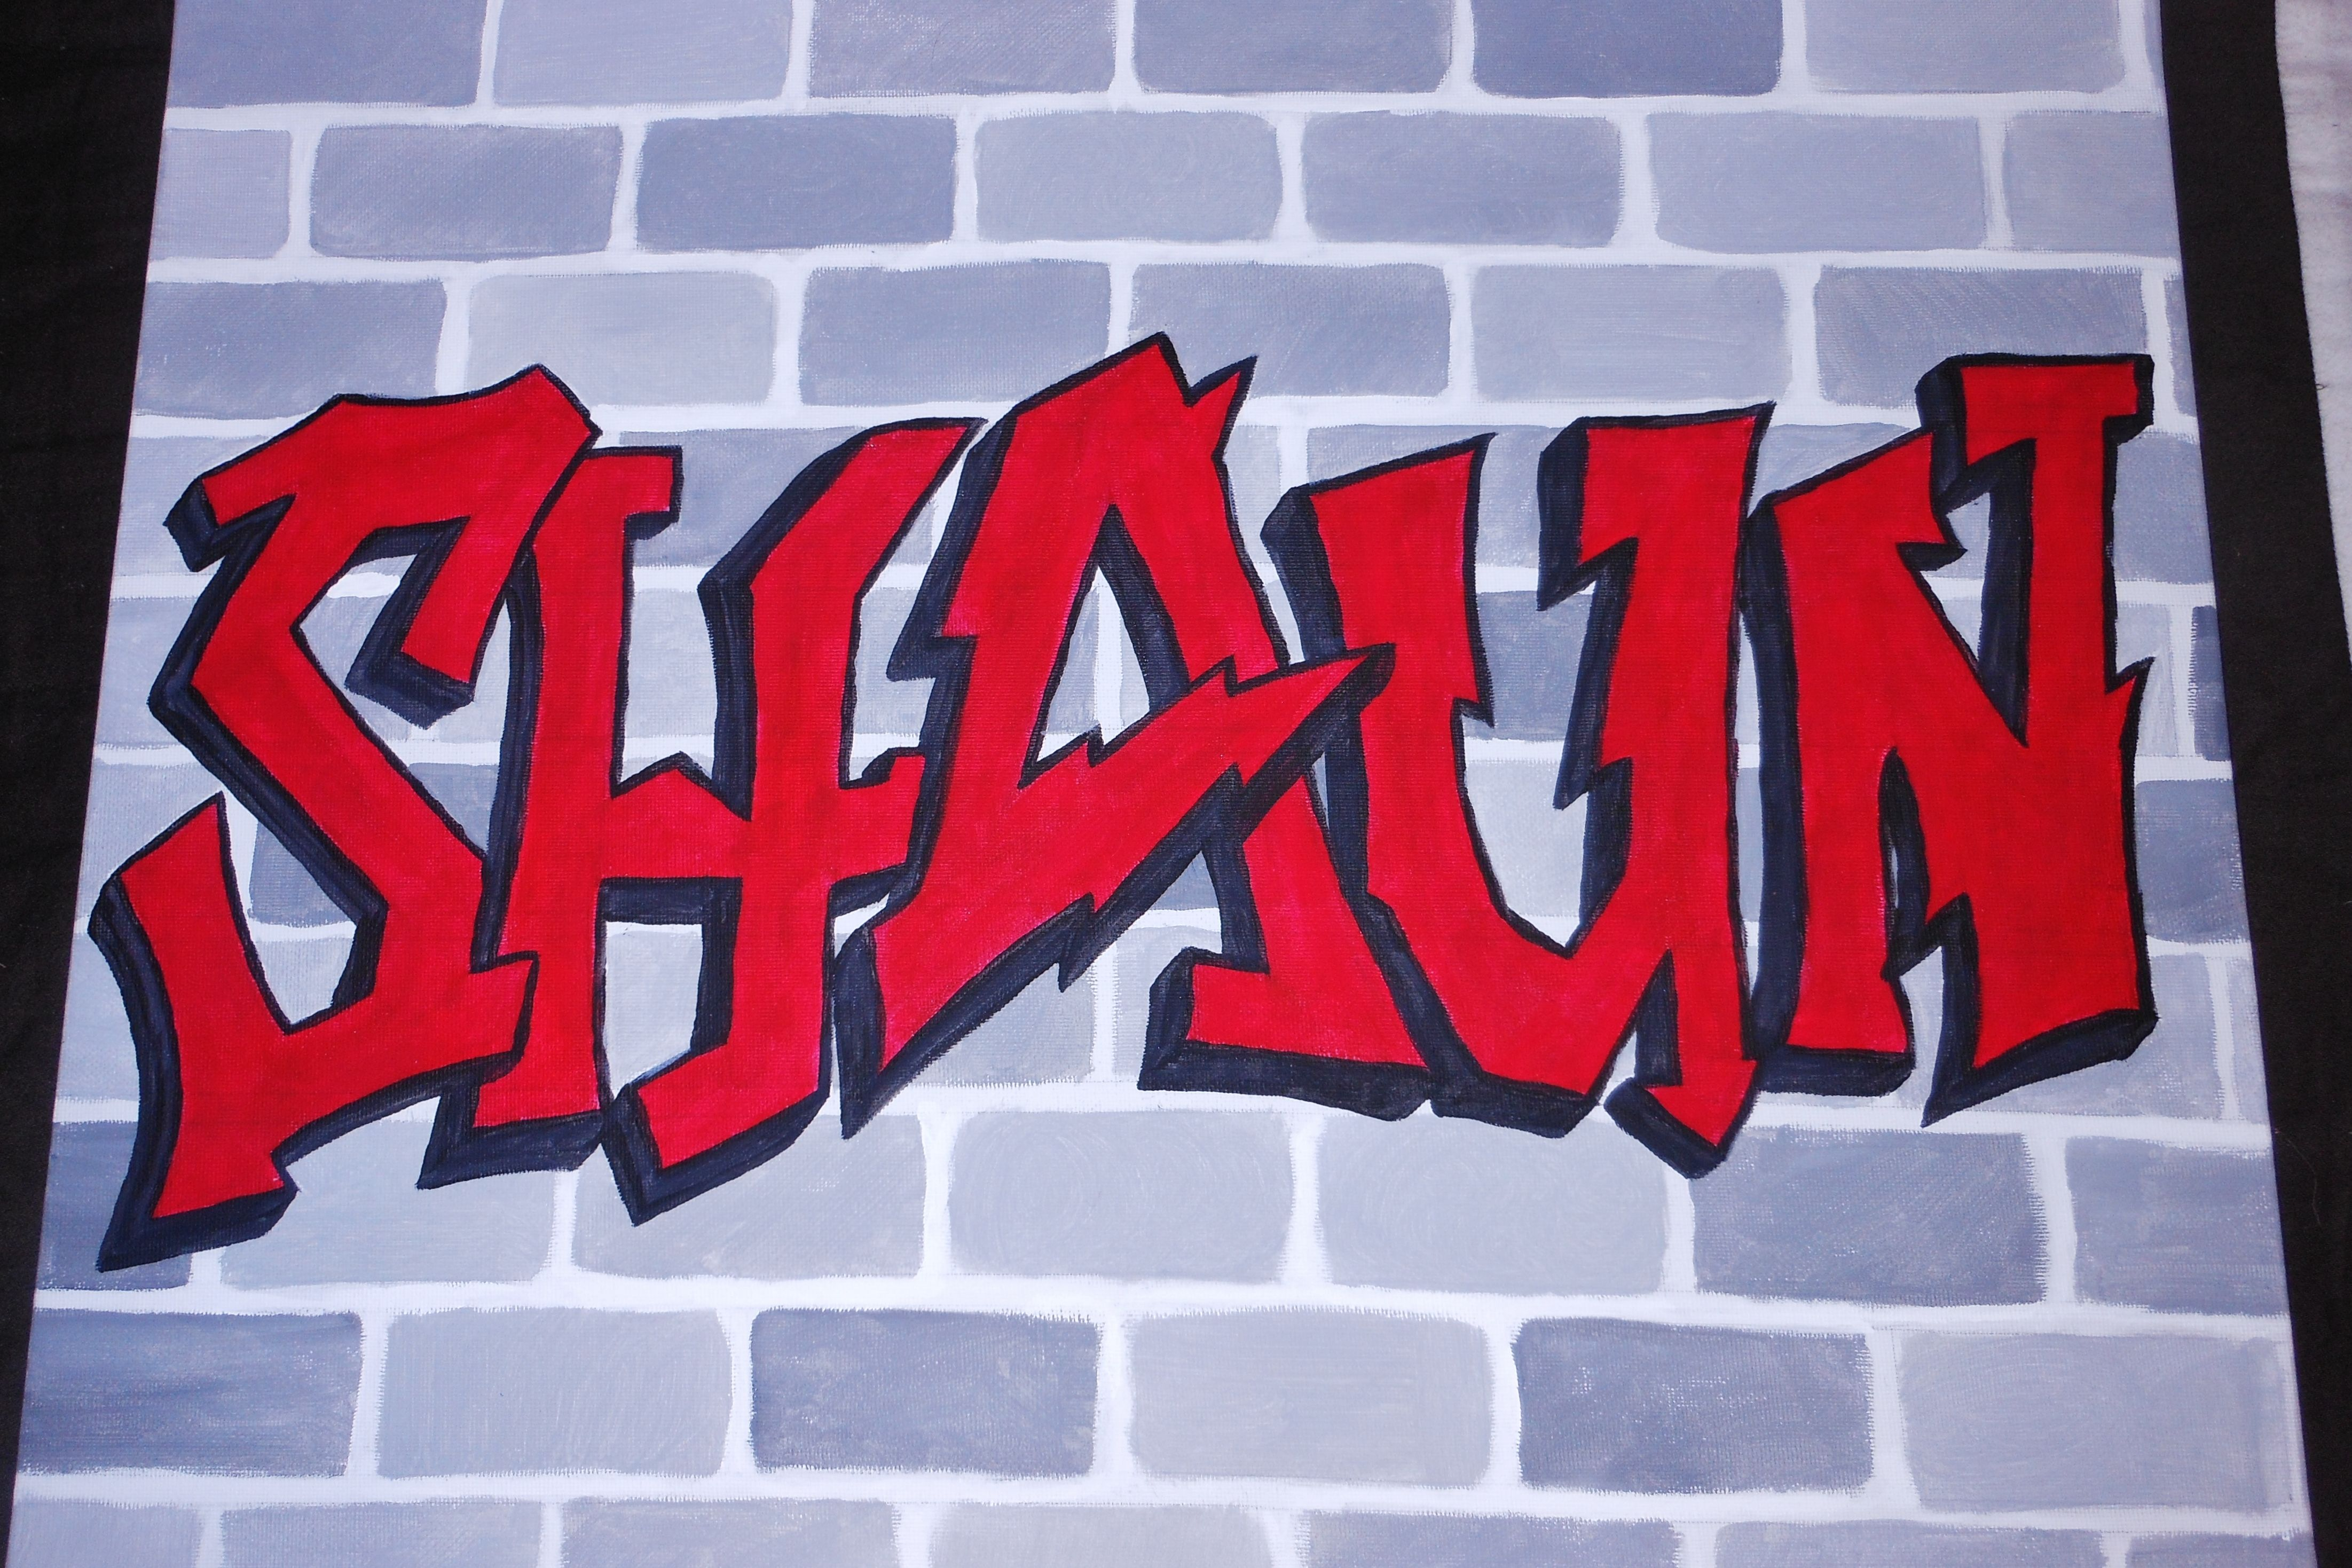 Pin by jessica nichols on my creations graffiti names